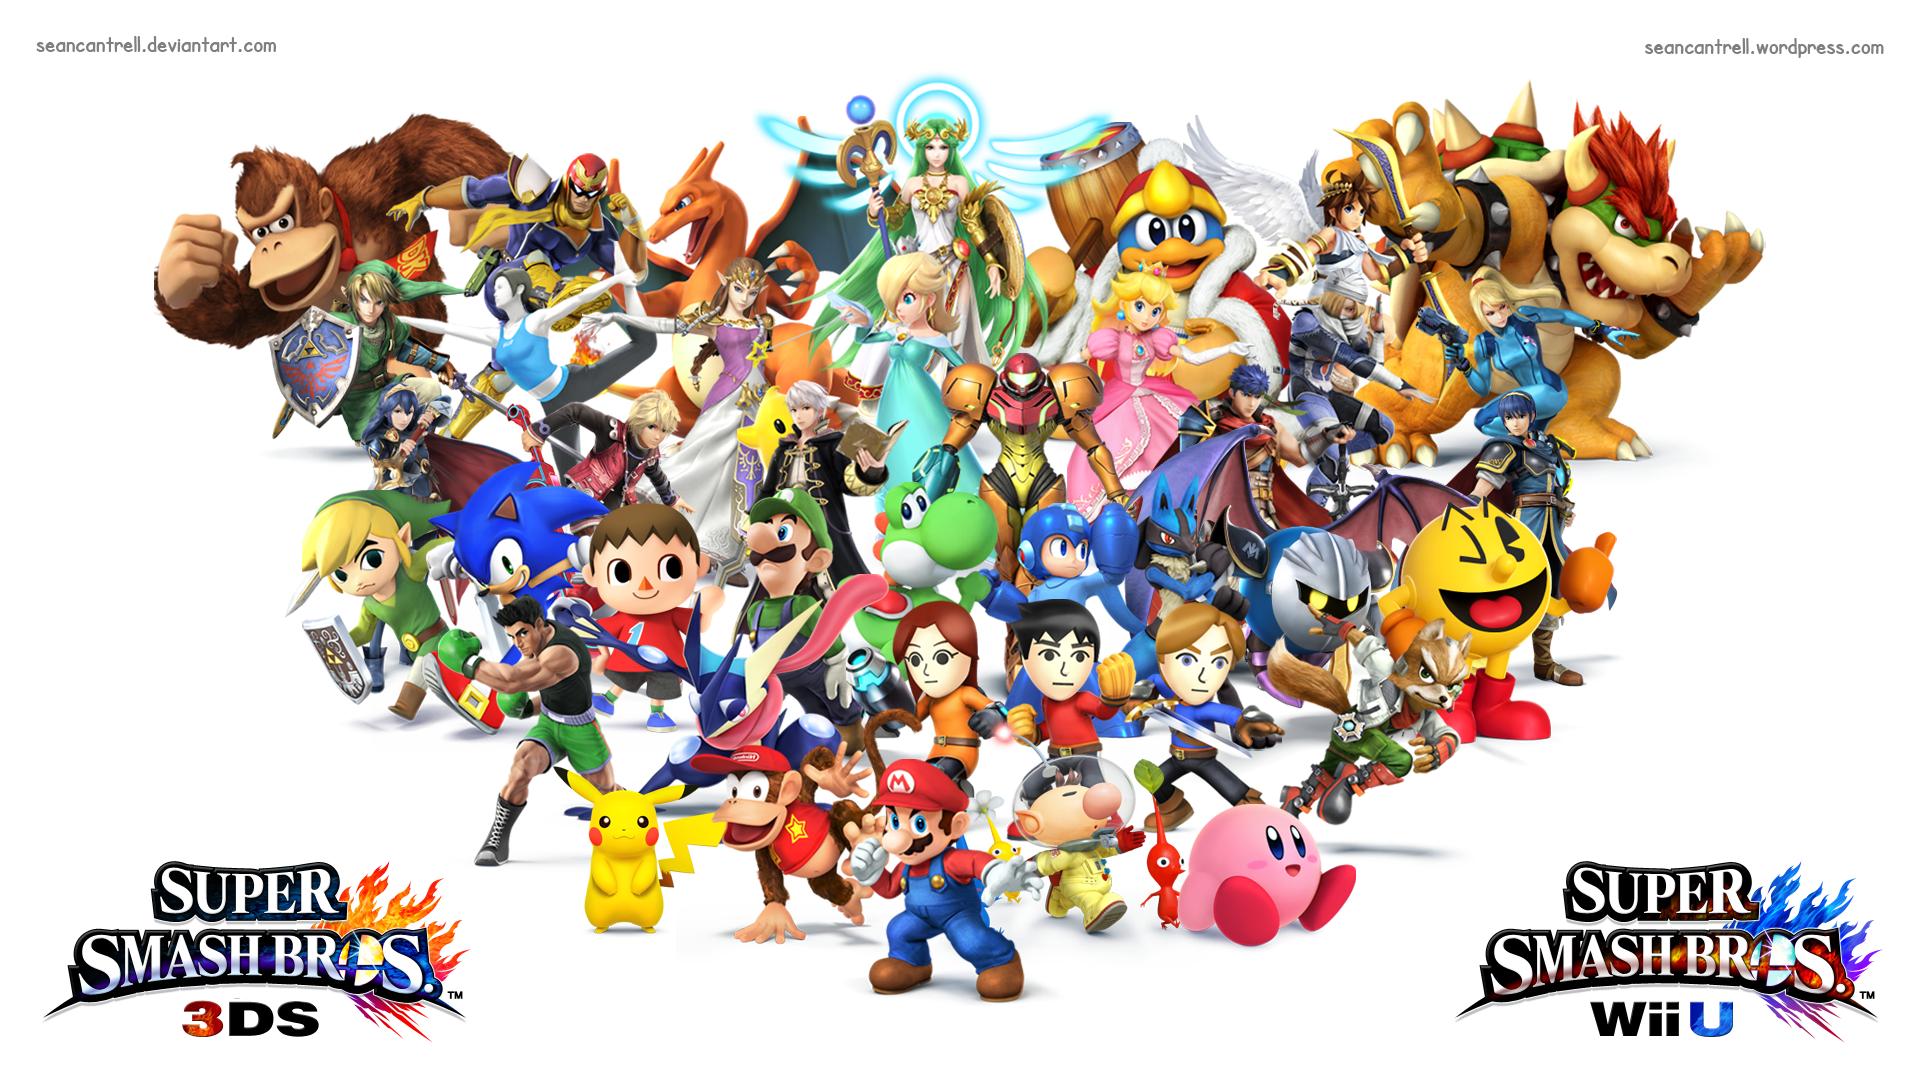 [50+] Smash Bros Wii U Wallpaper on WallpaperSafari